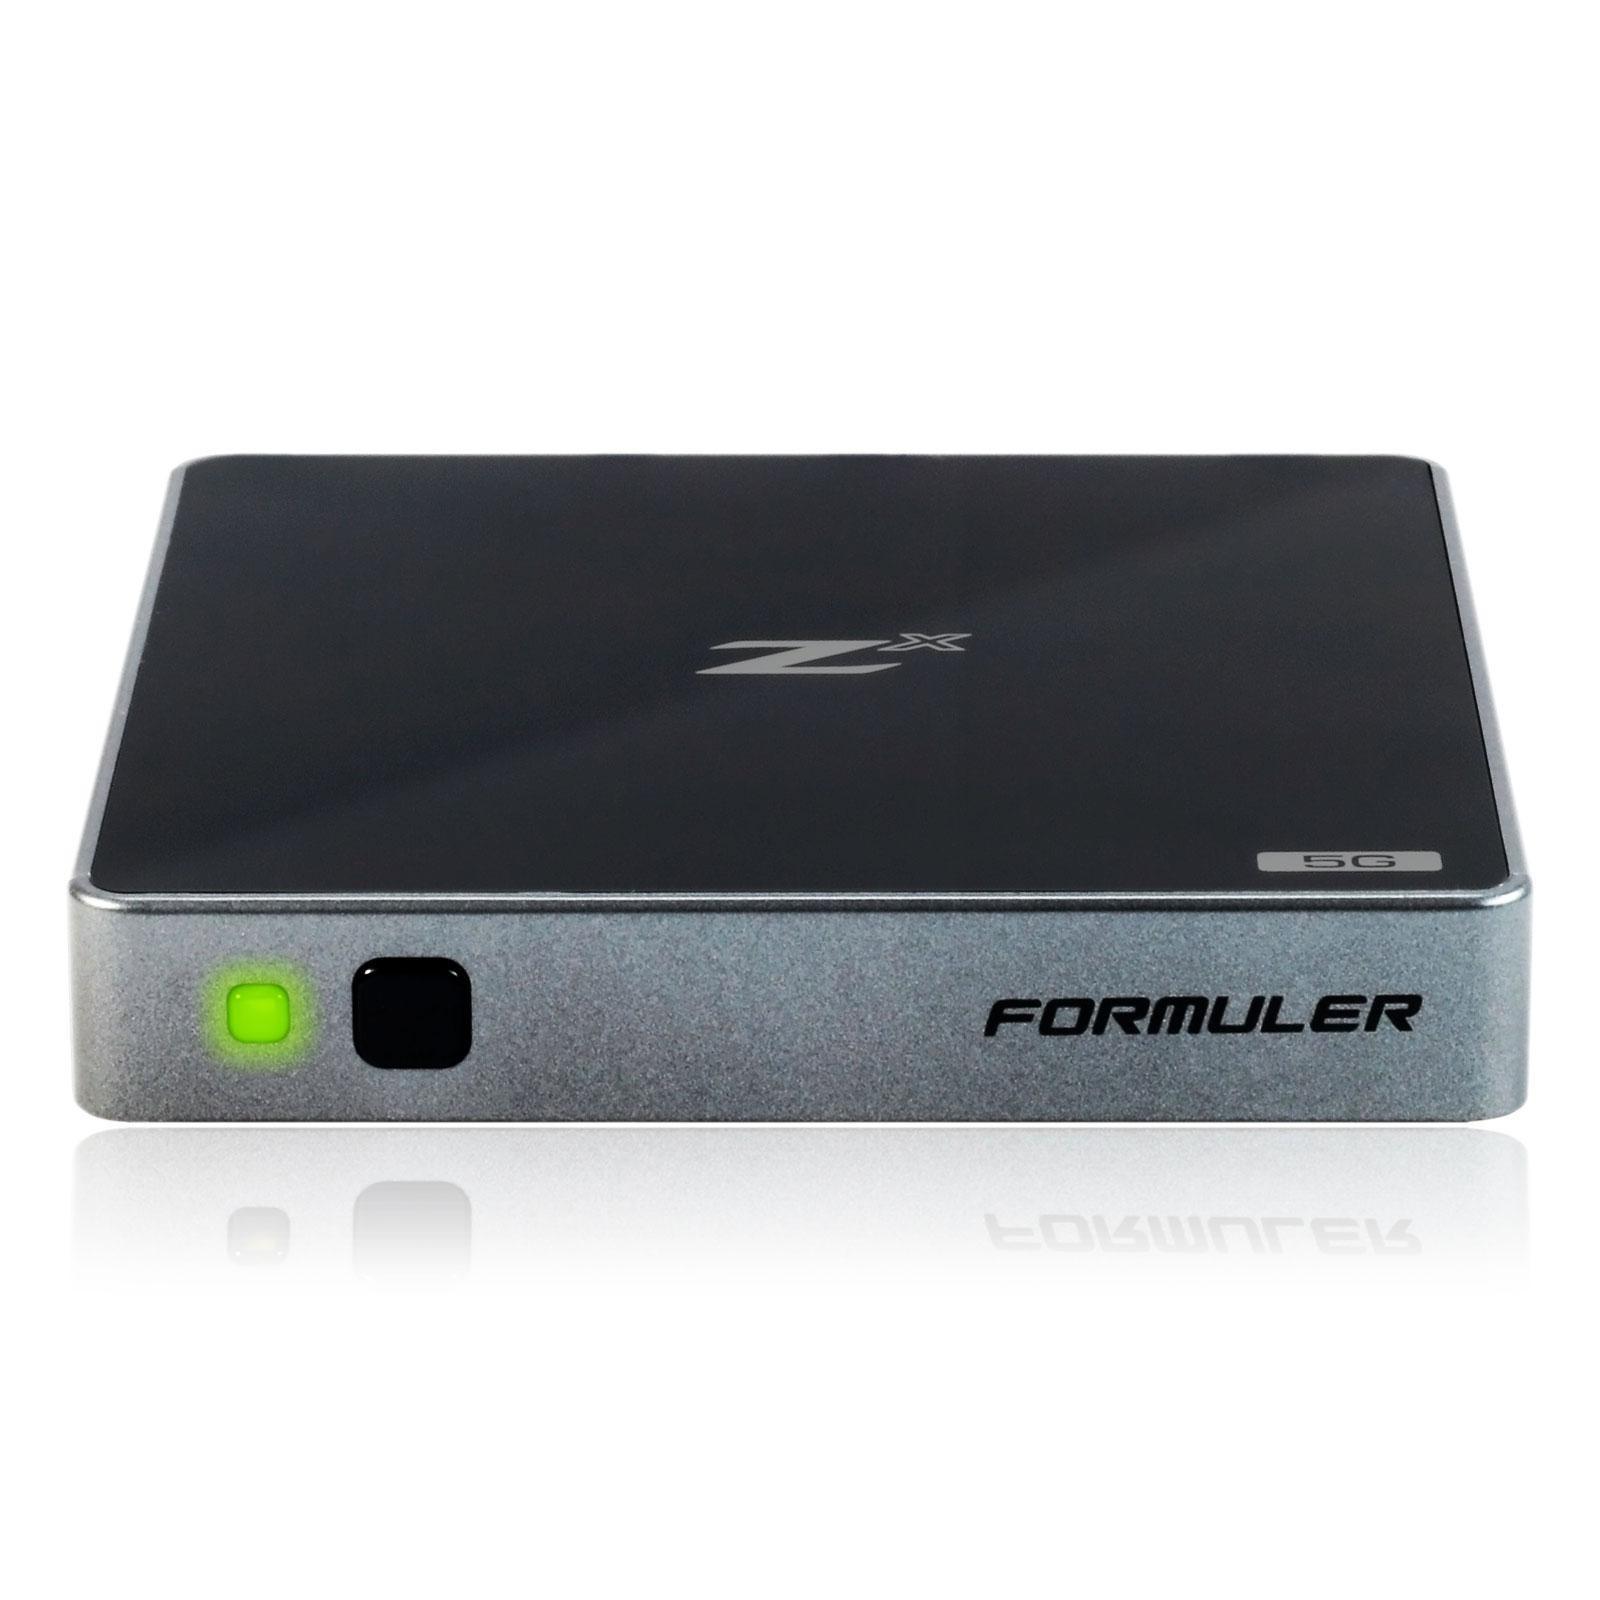 Formuler Zx 5G 4K UHD IPTV Android 7 0 Player H 265 HEVC Kodi 5GHz Wifi